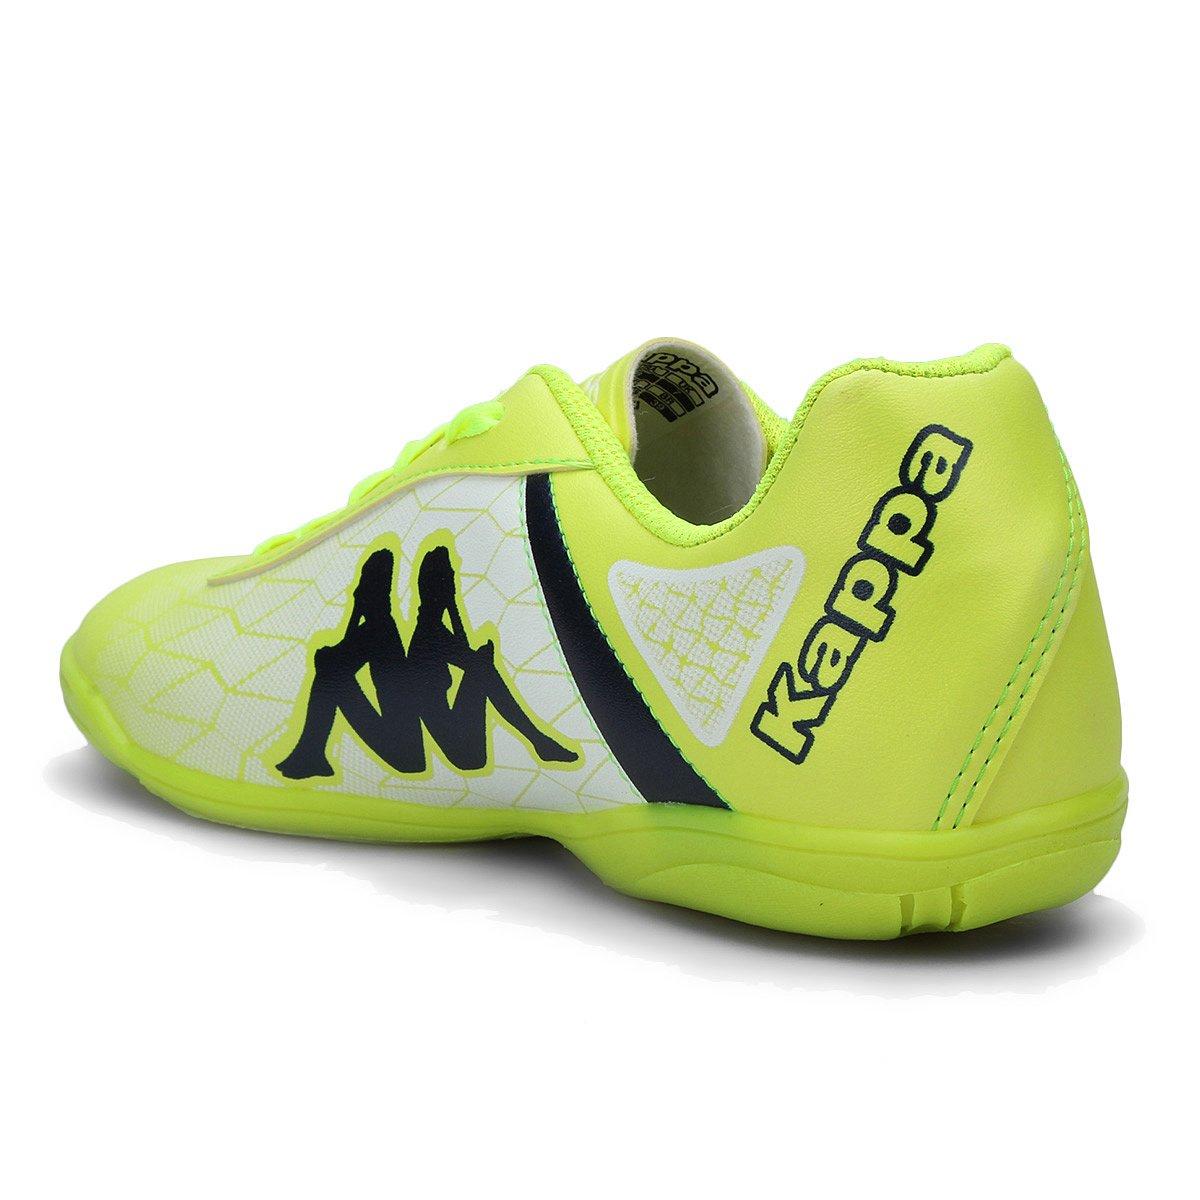 8d5e9de133 Chuteira Futsal Kappa Torpedo - Verde e Branco - Compre Agora